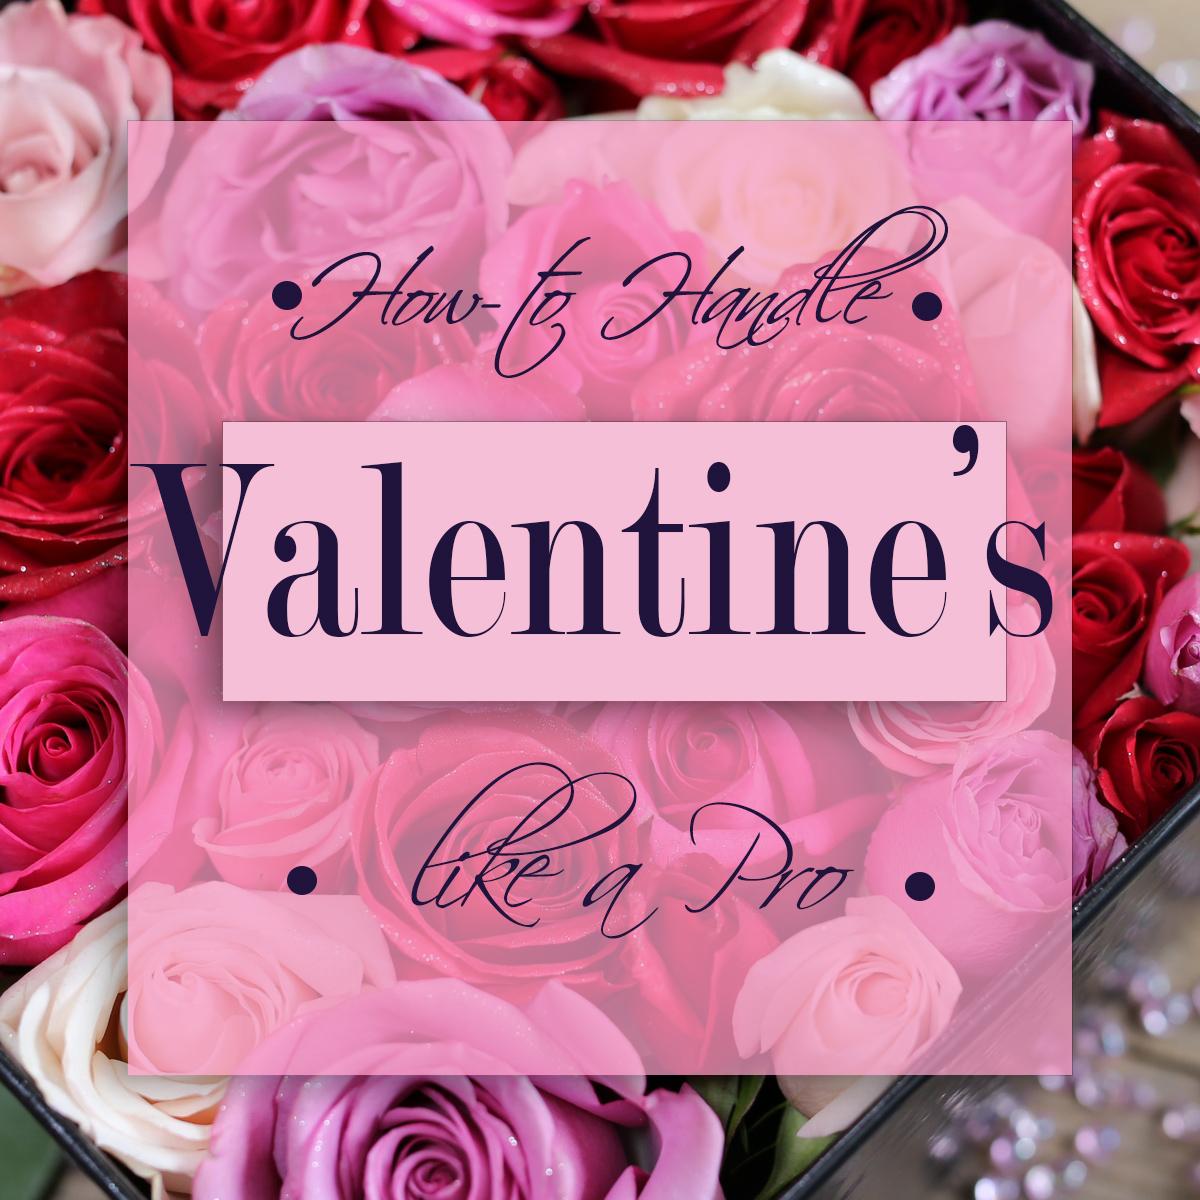 Valentine's Day 2018 BLOG POST